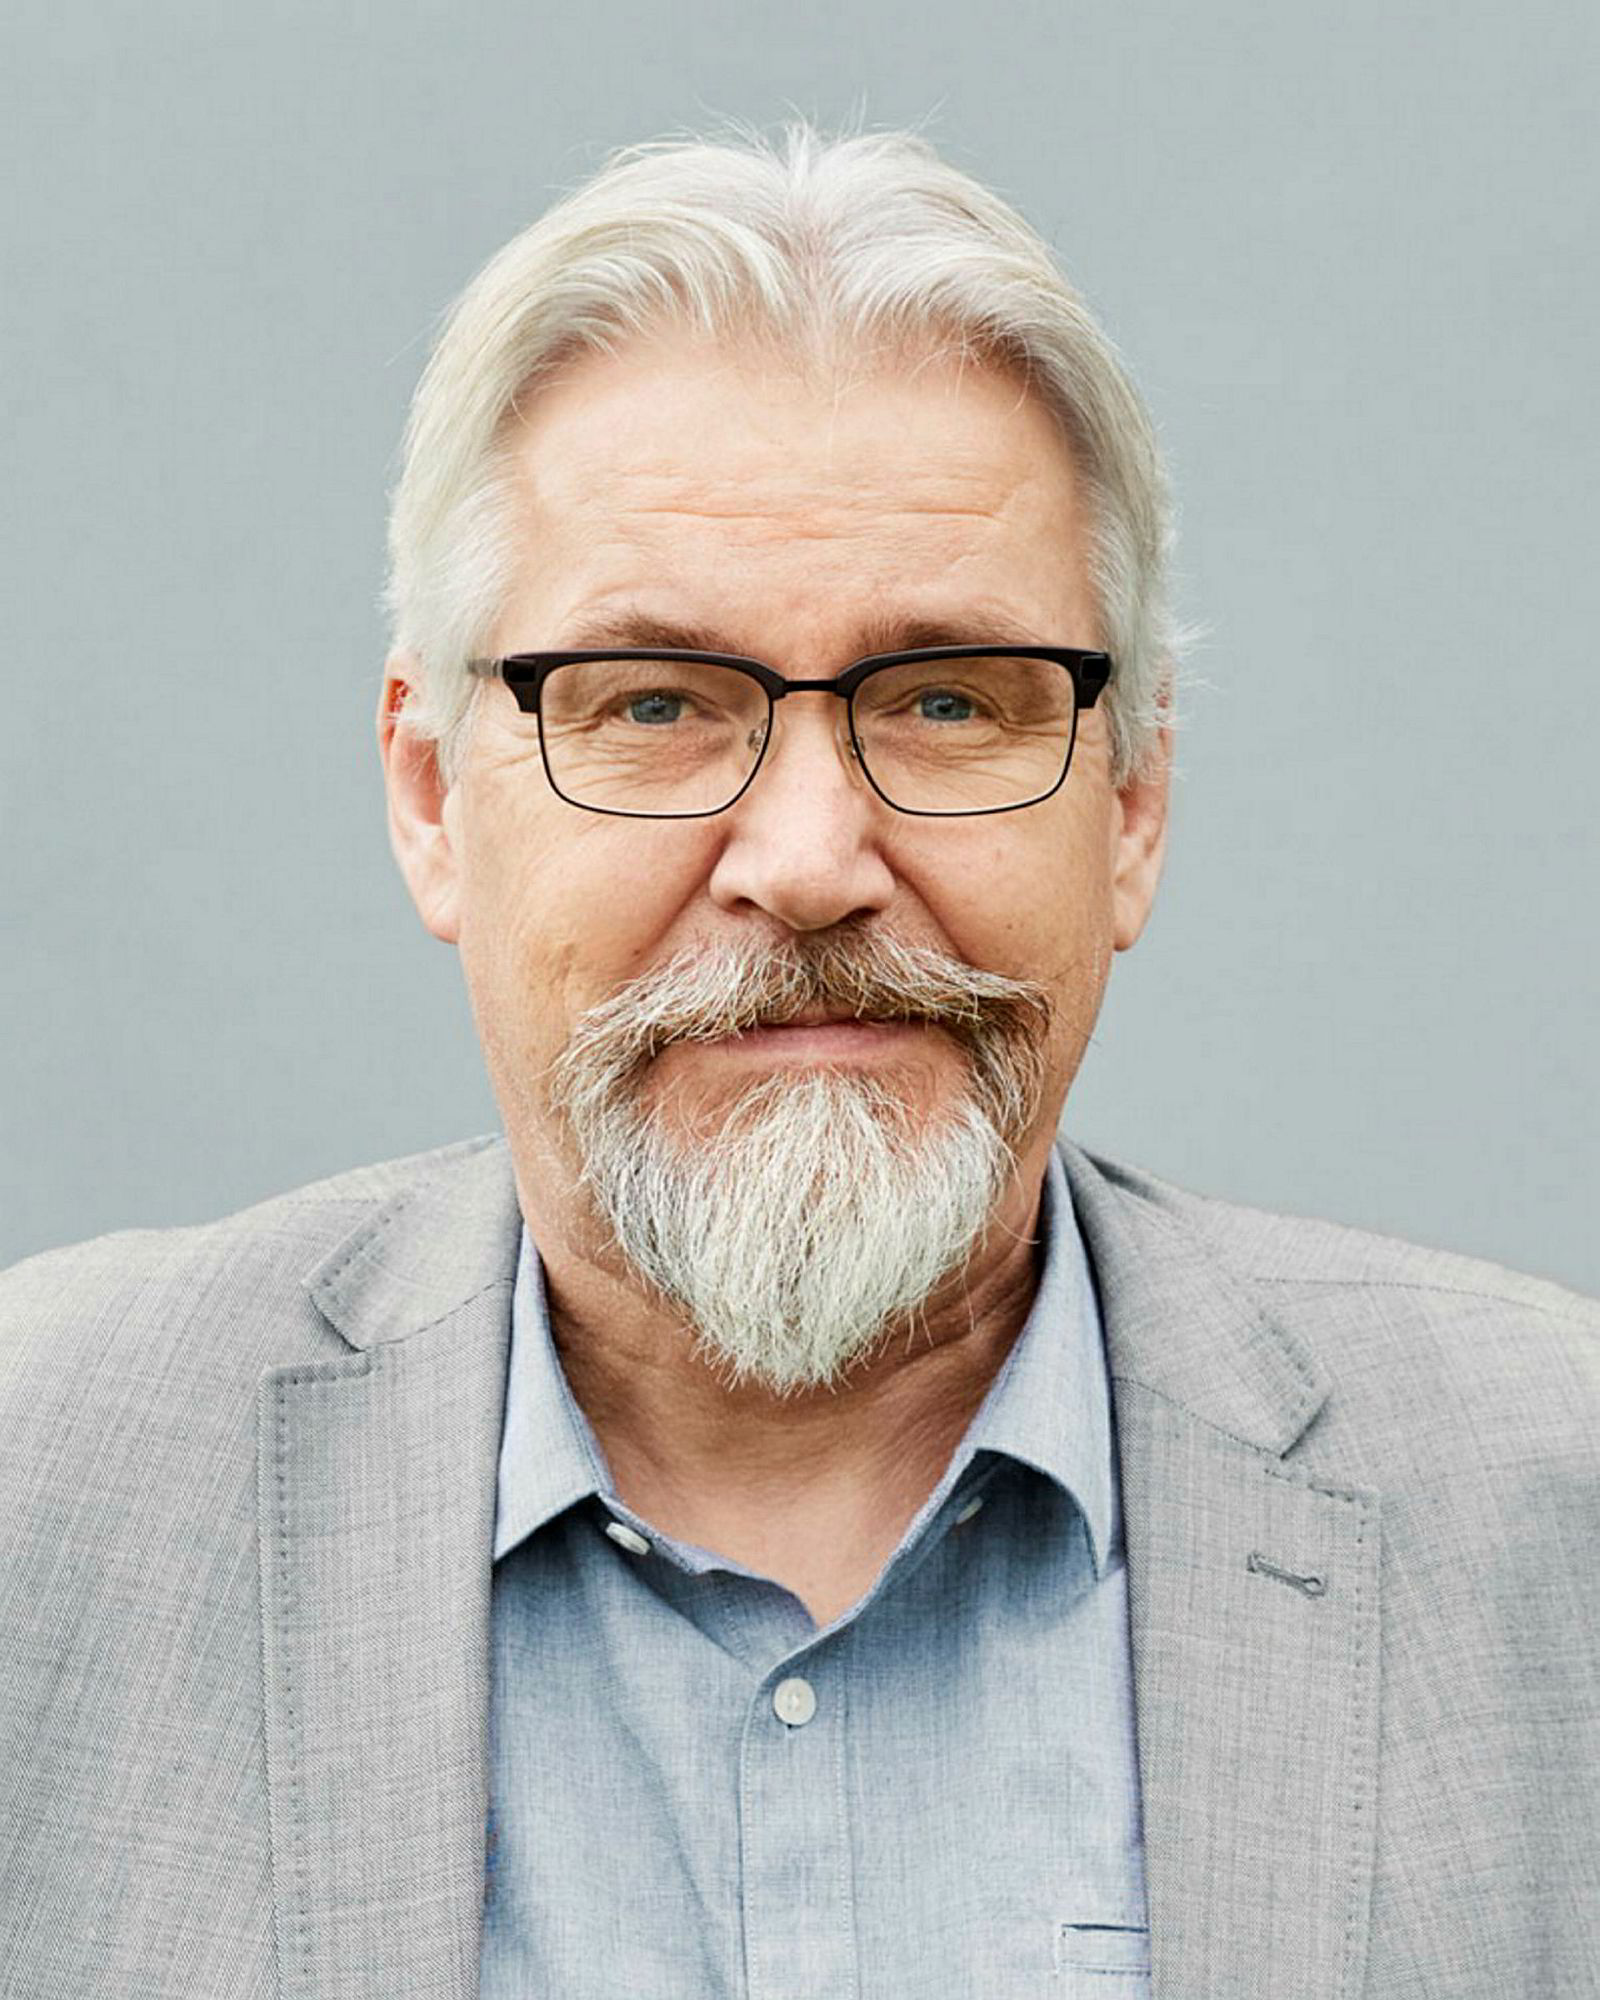 – Det er absolutt ingenting som tyder på at hydroxyklorokin har noen som helst virkning mot korona, sier Jonas Einarsson, sjef i Radforsk.